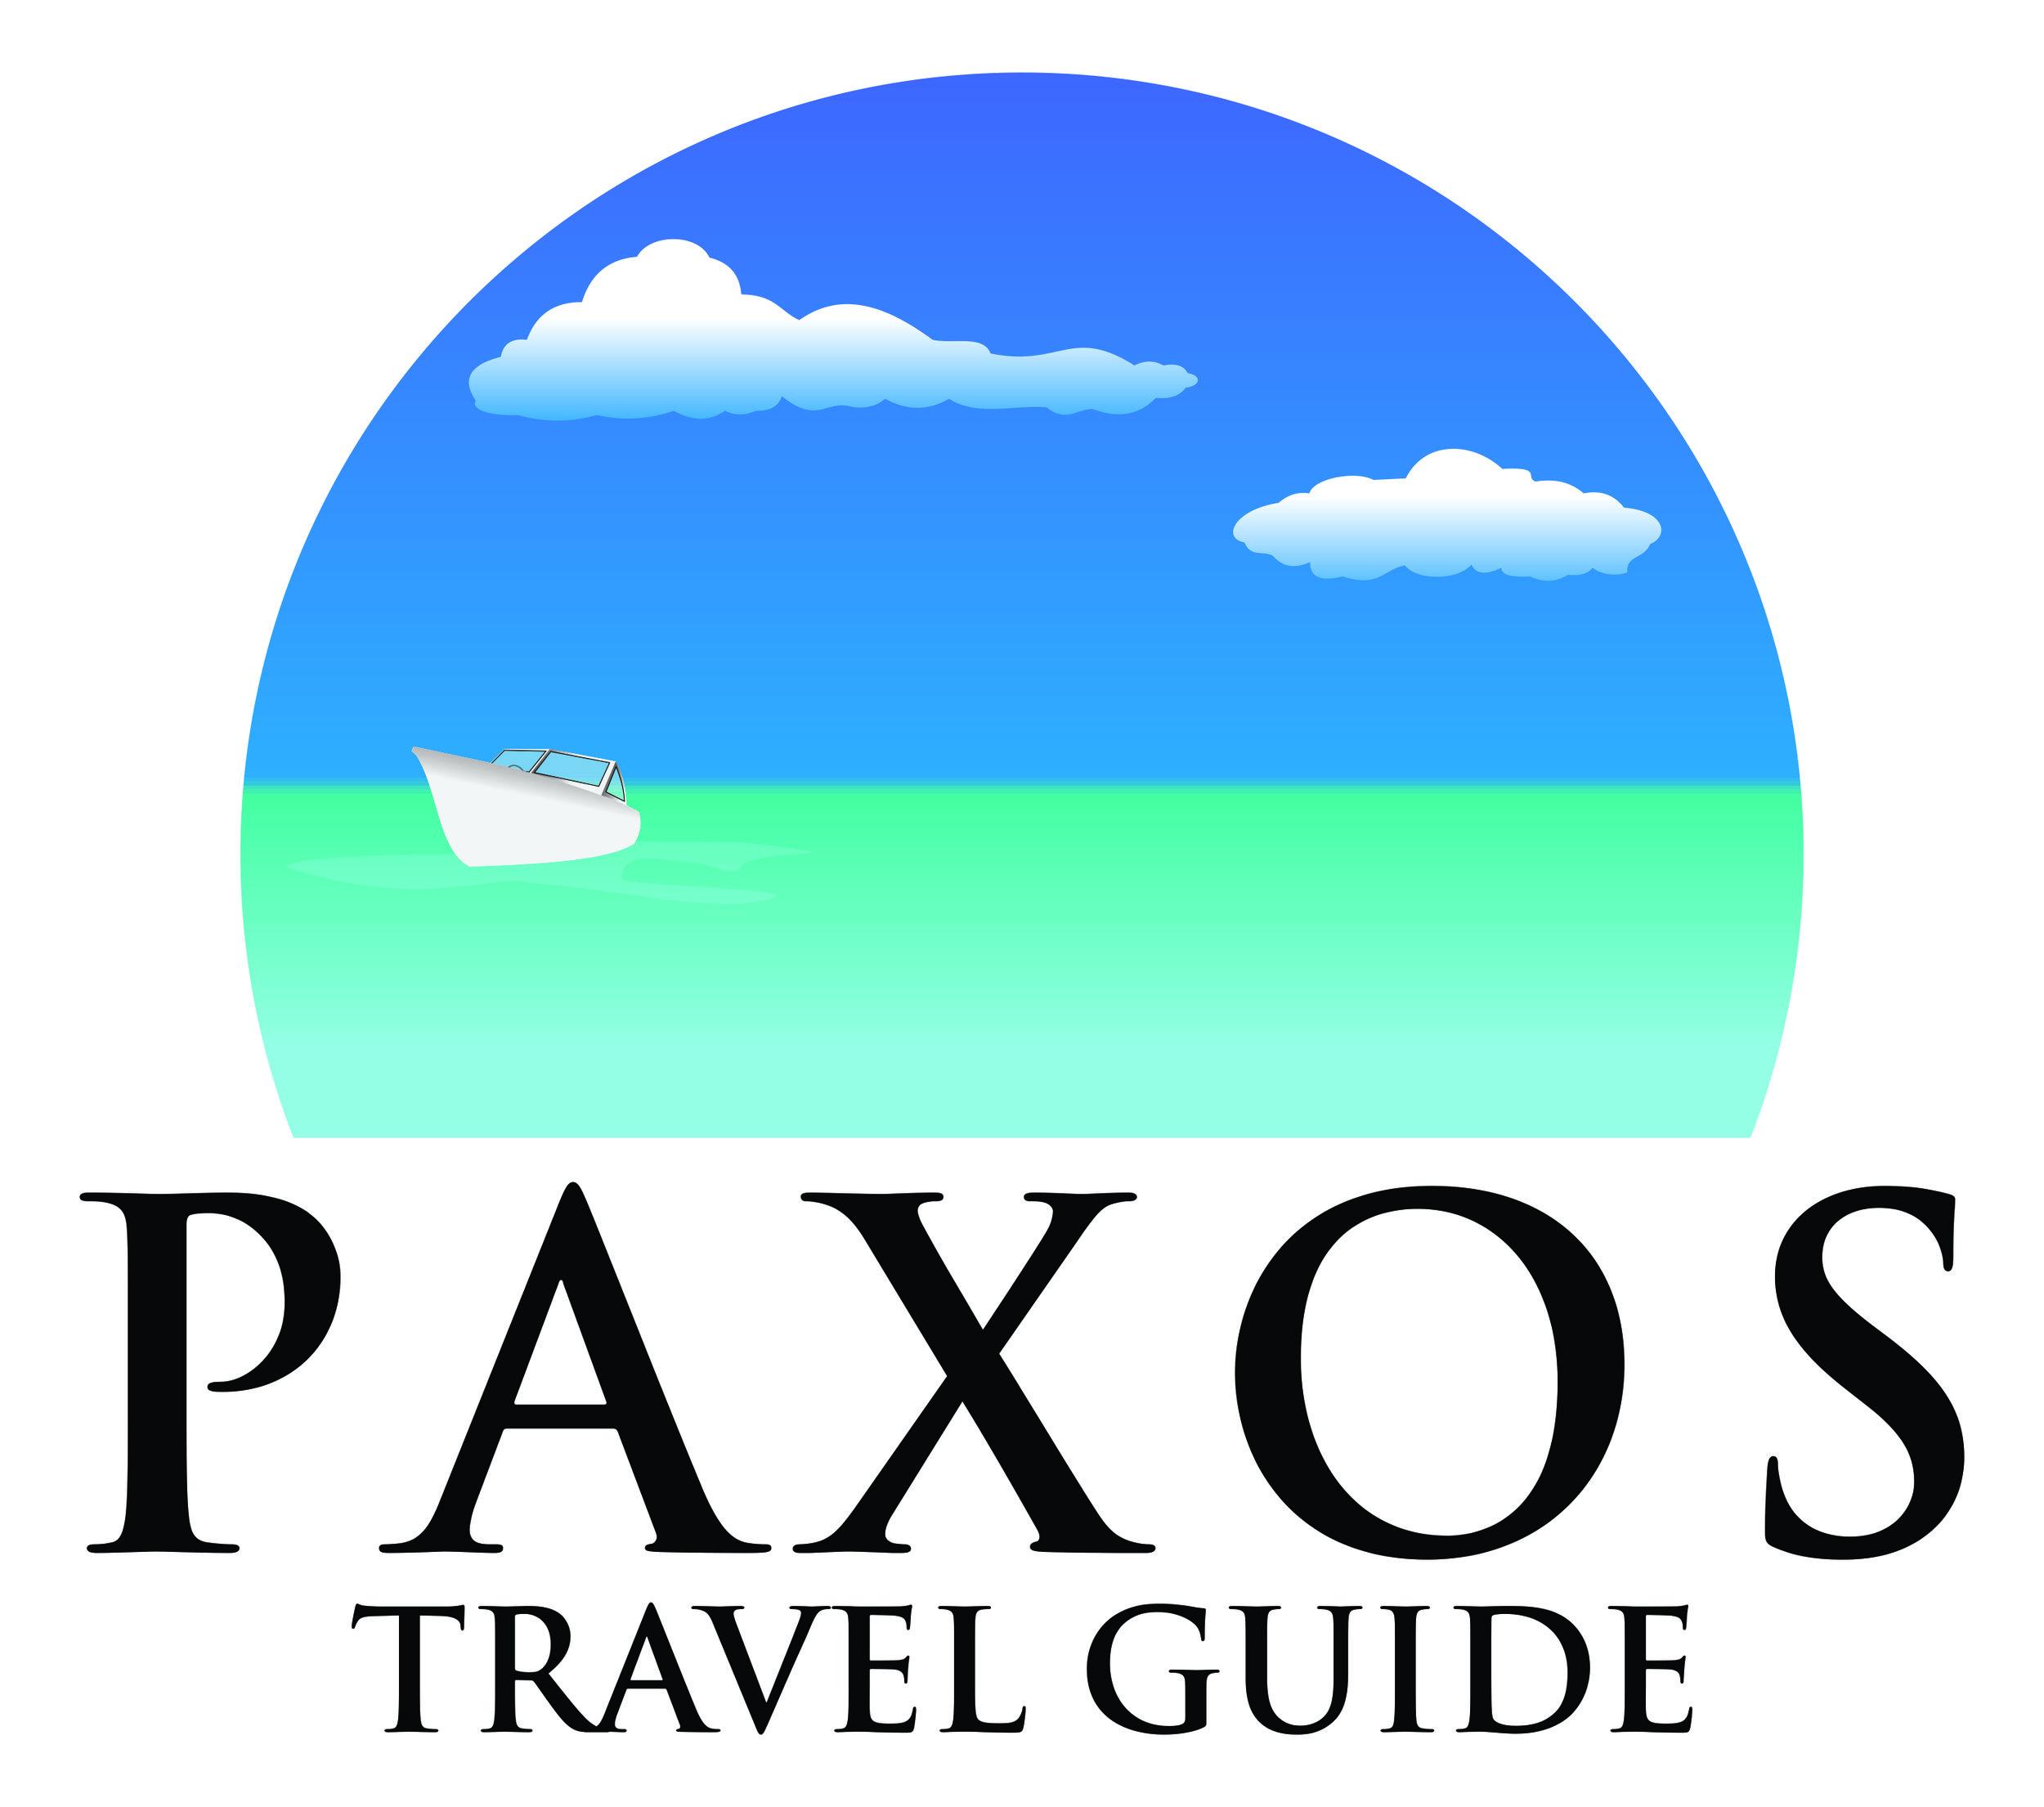 Paxos Travel Guide - JPG.jpg